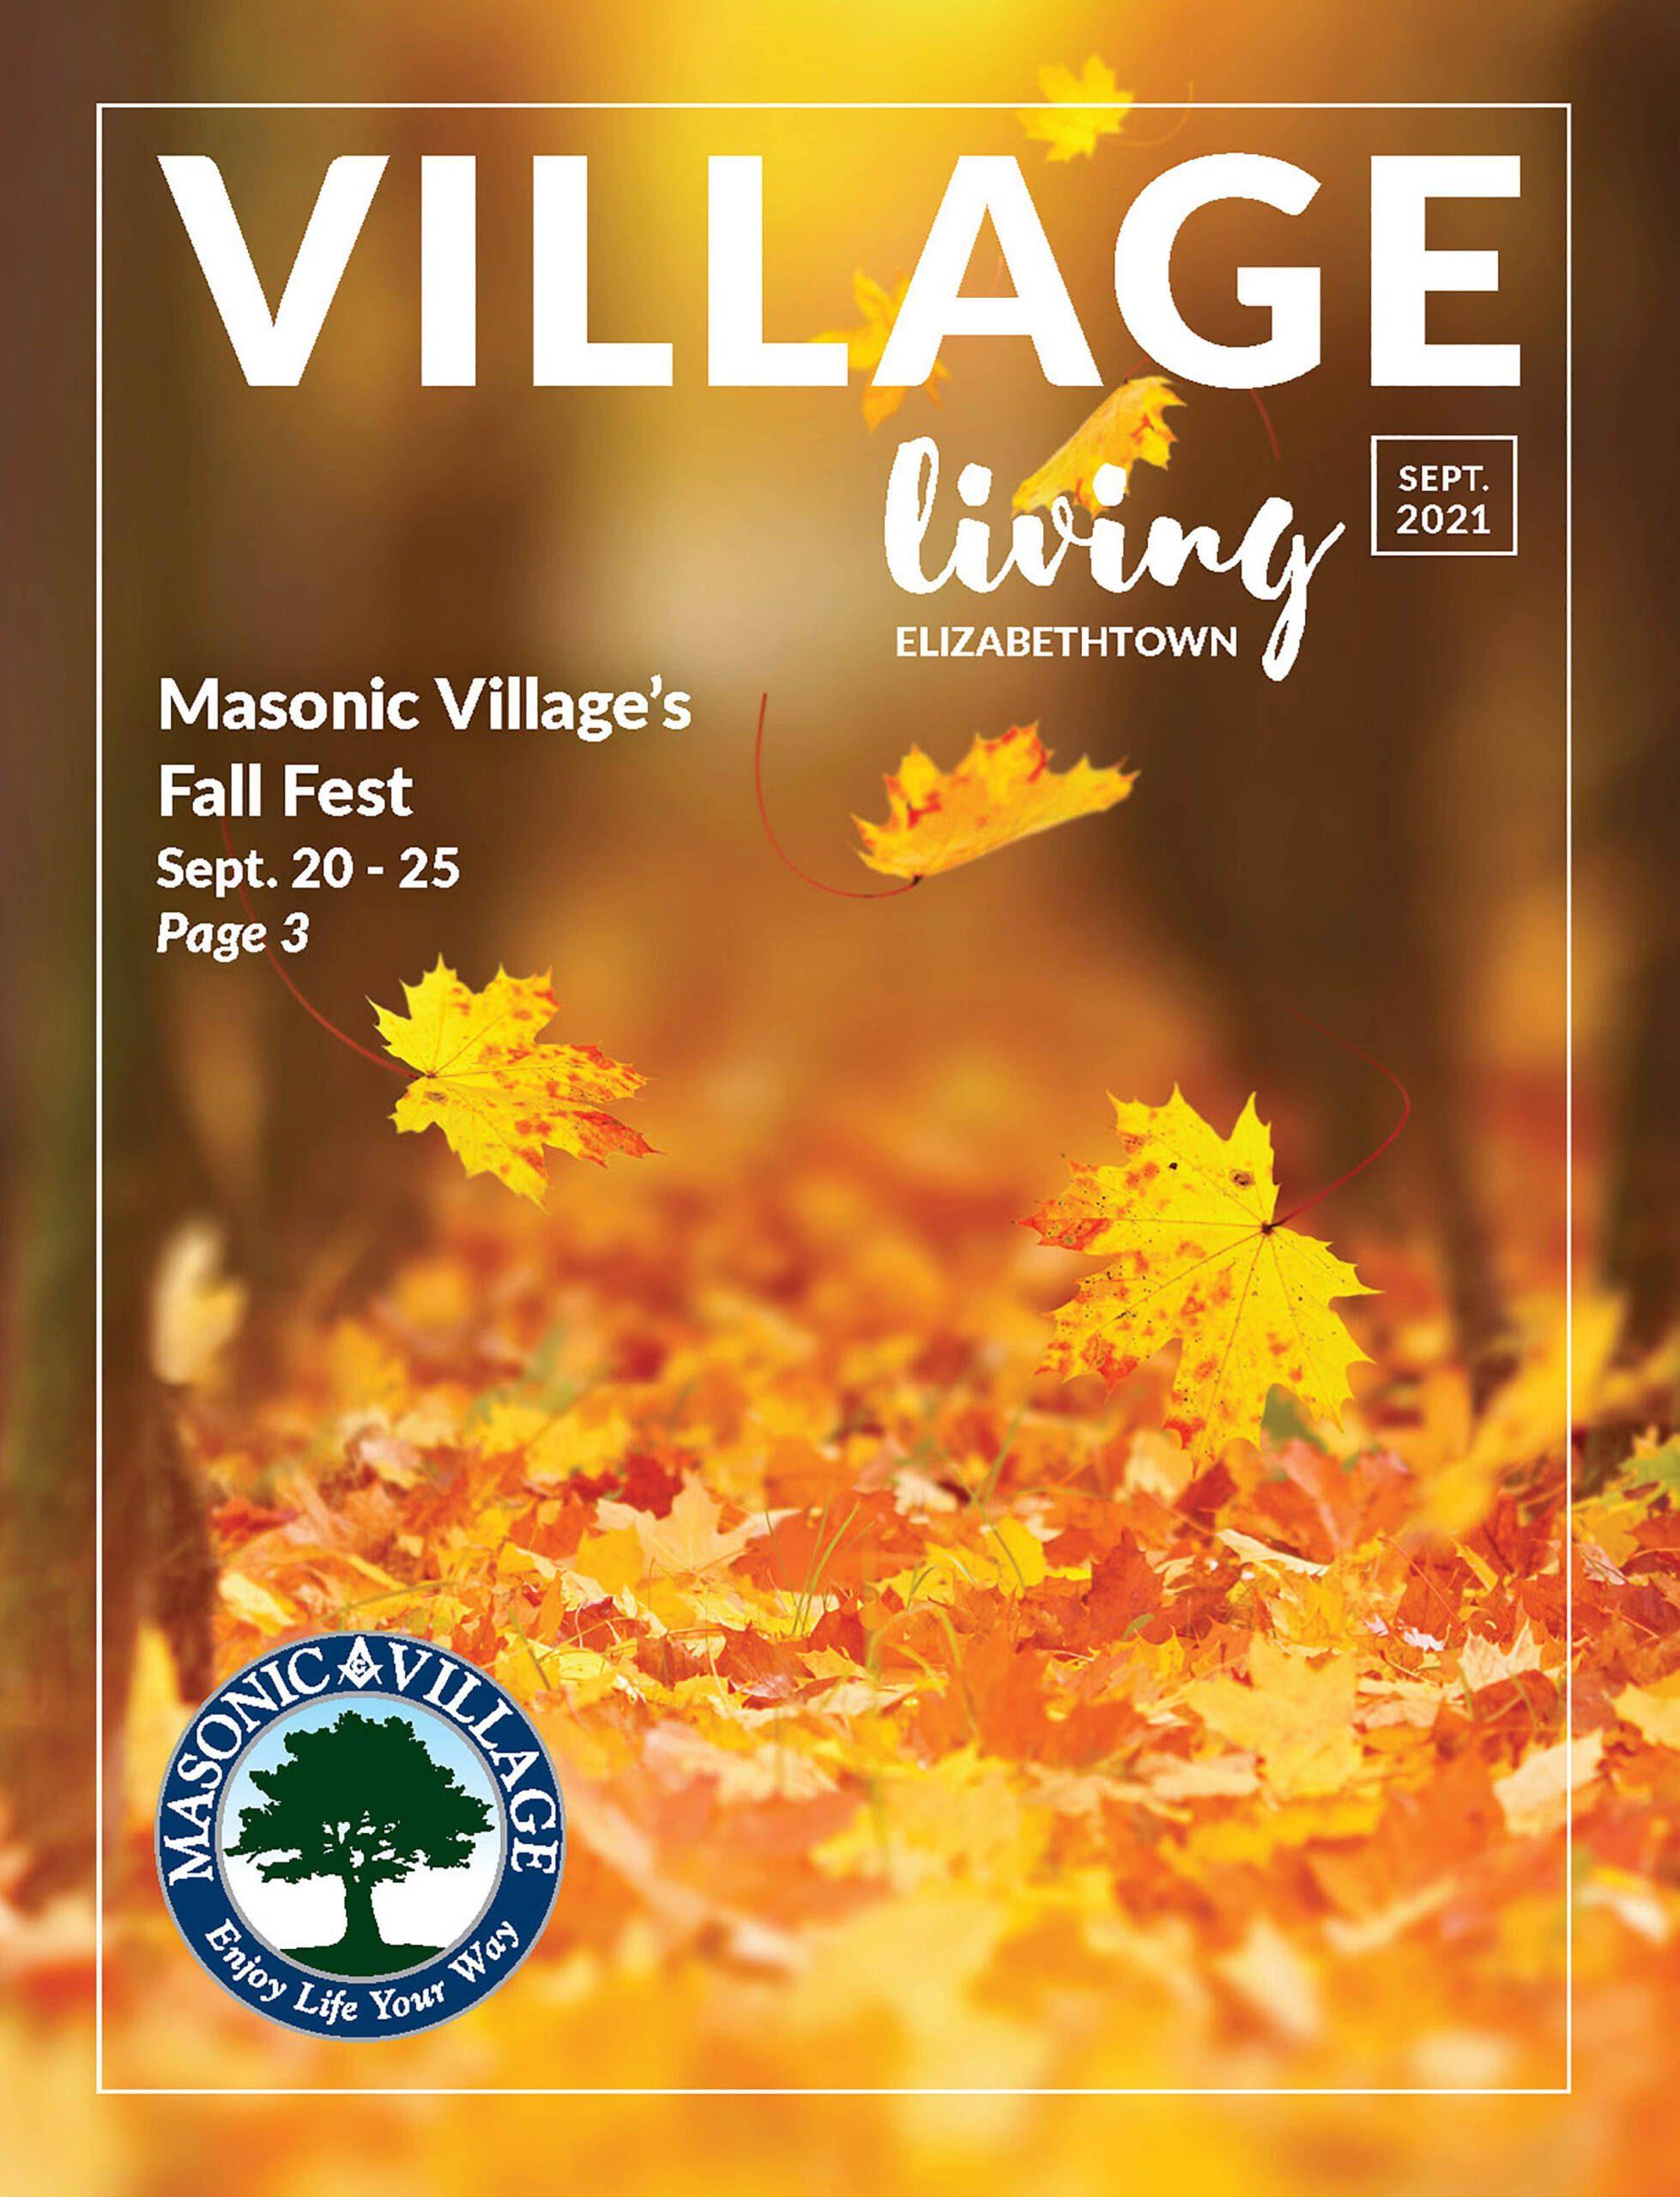 Elizabethtown Village Living - Sept 2021